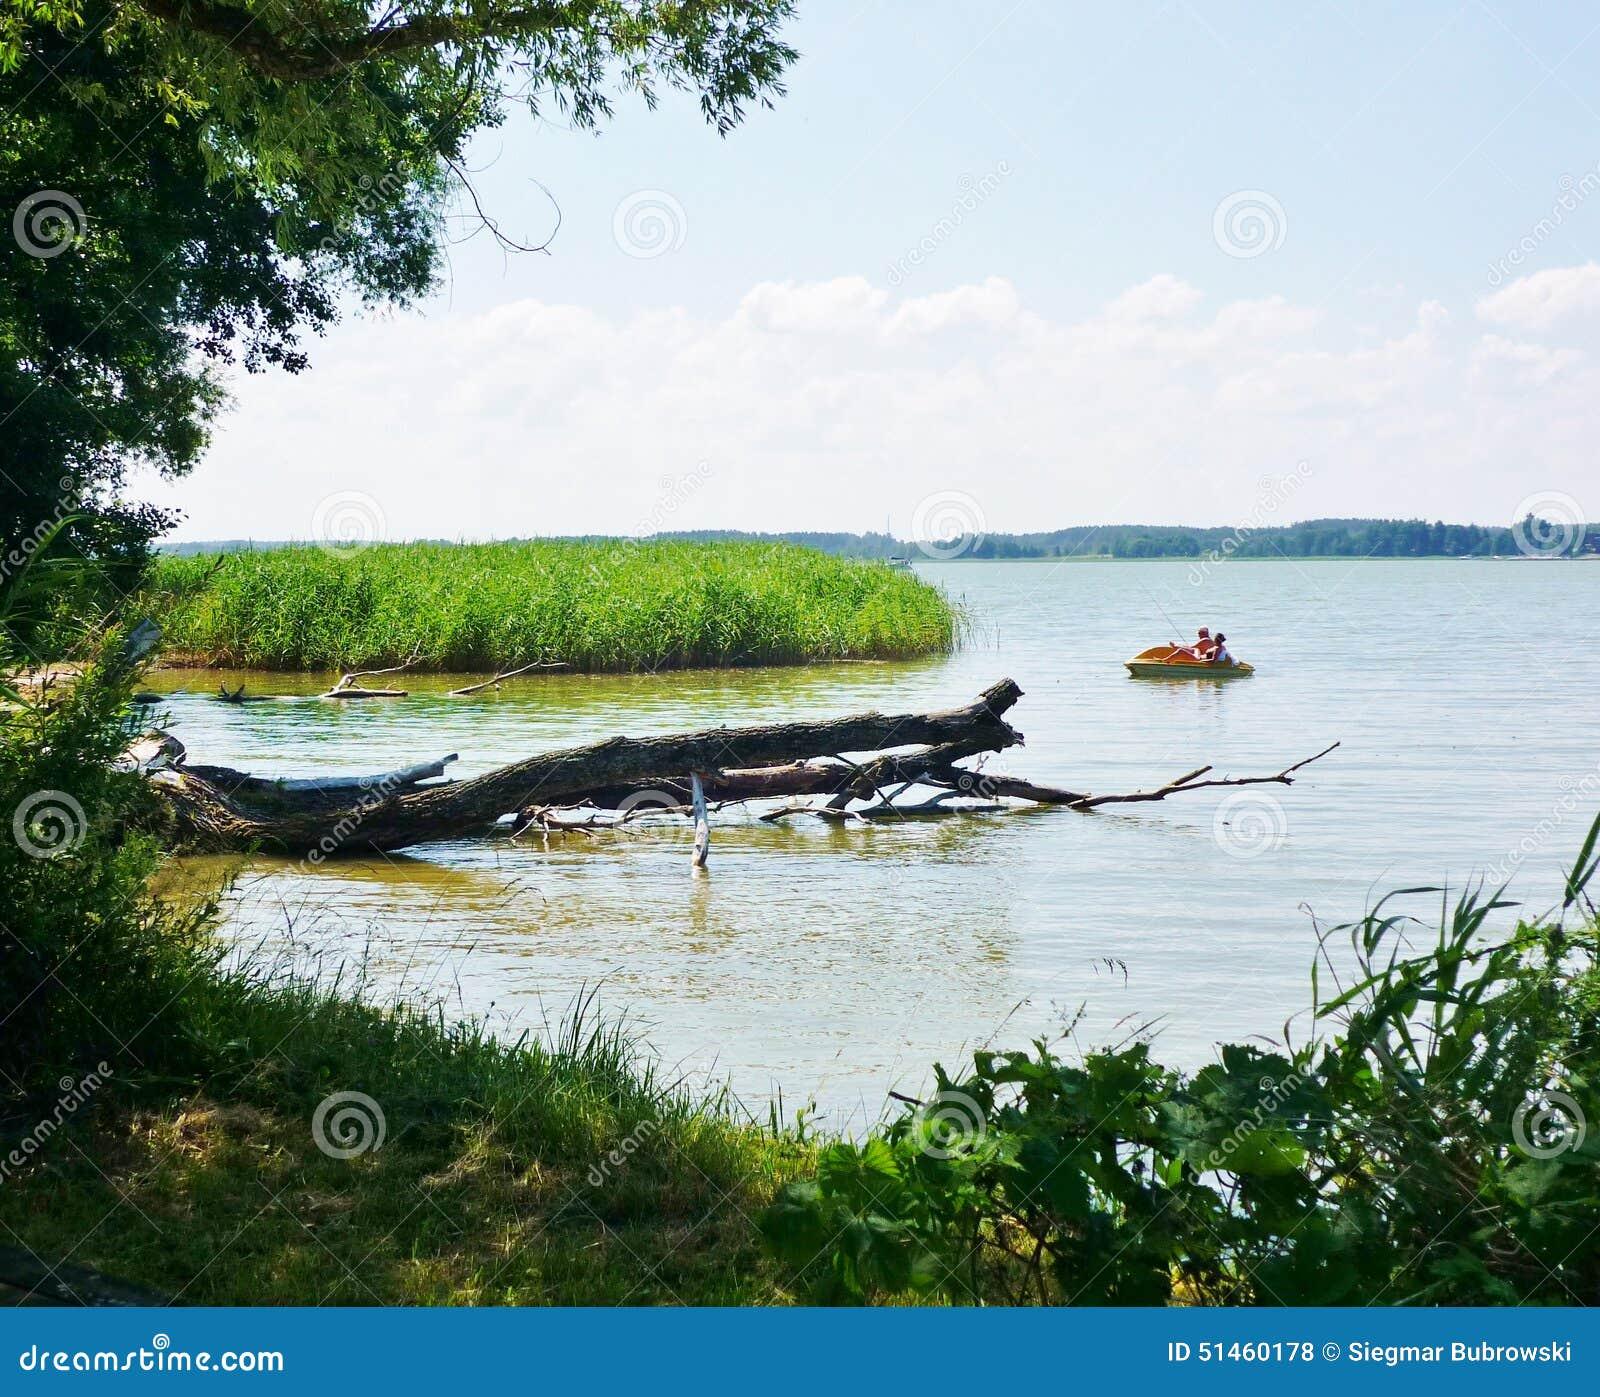 Beautiful Lake House Homes: Masurian Lake Stock Photo